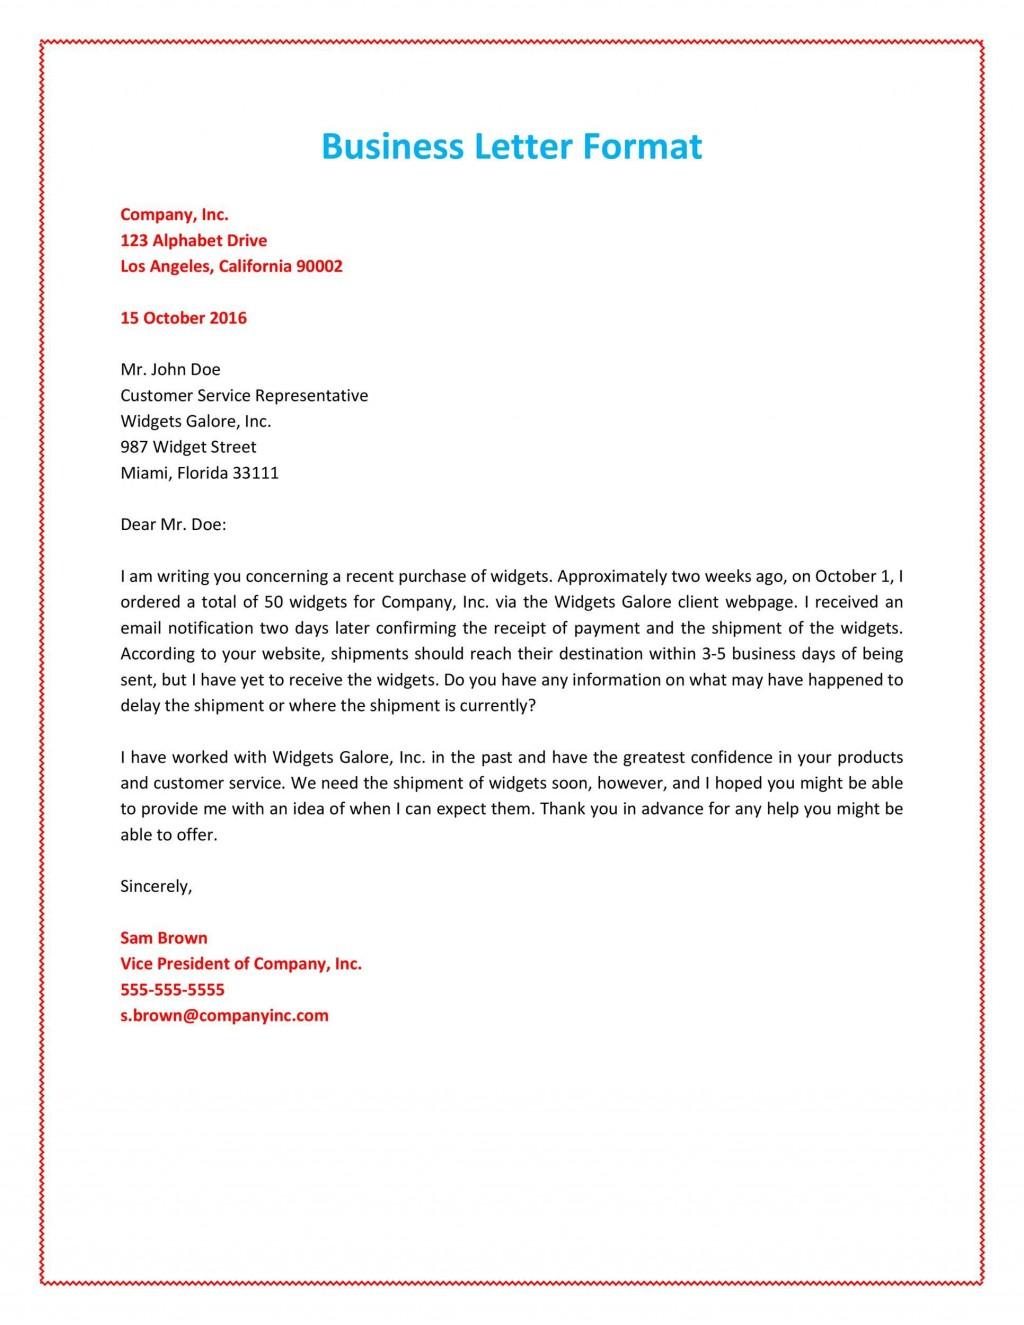 004 Striking Sample Busines Letter Template Photo  Of Intent Formal FreeLarge